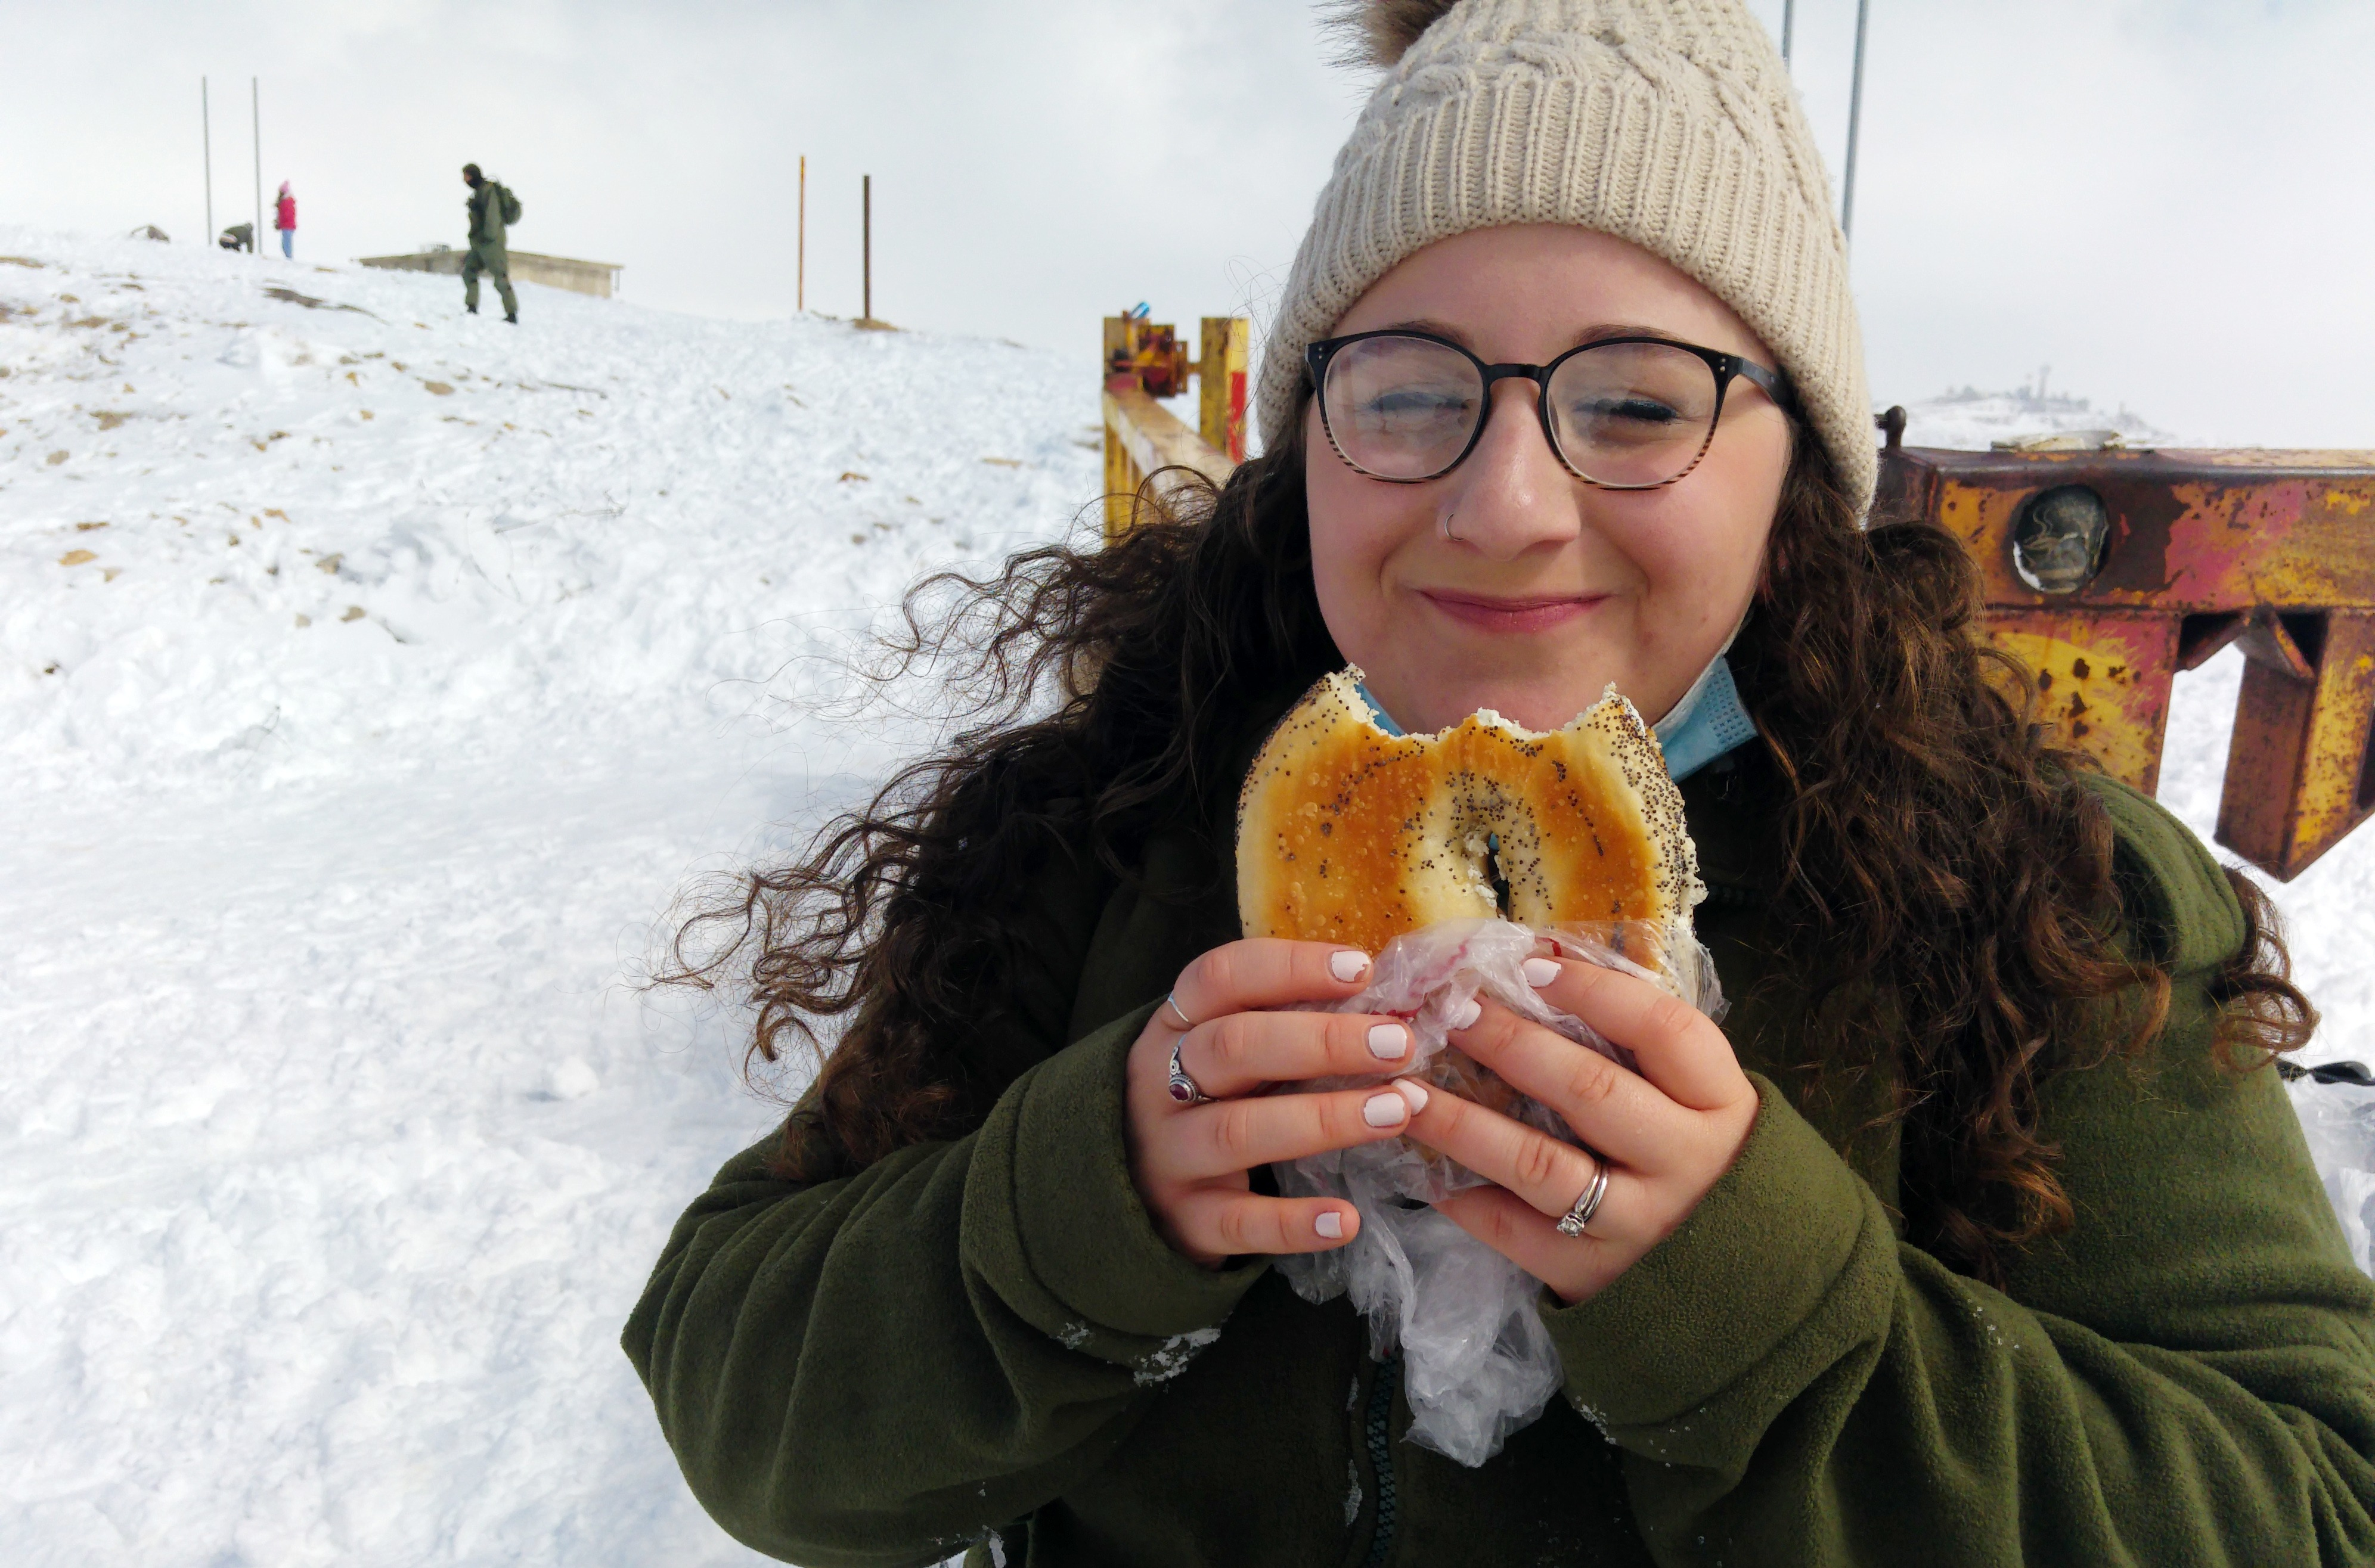 Bracha enjoying her bagel at the checkpoint